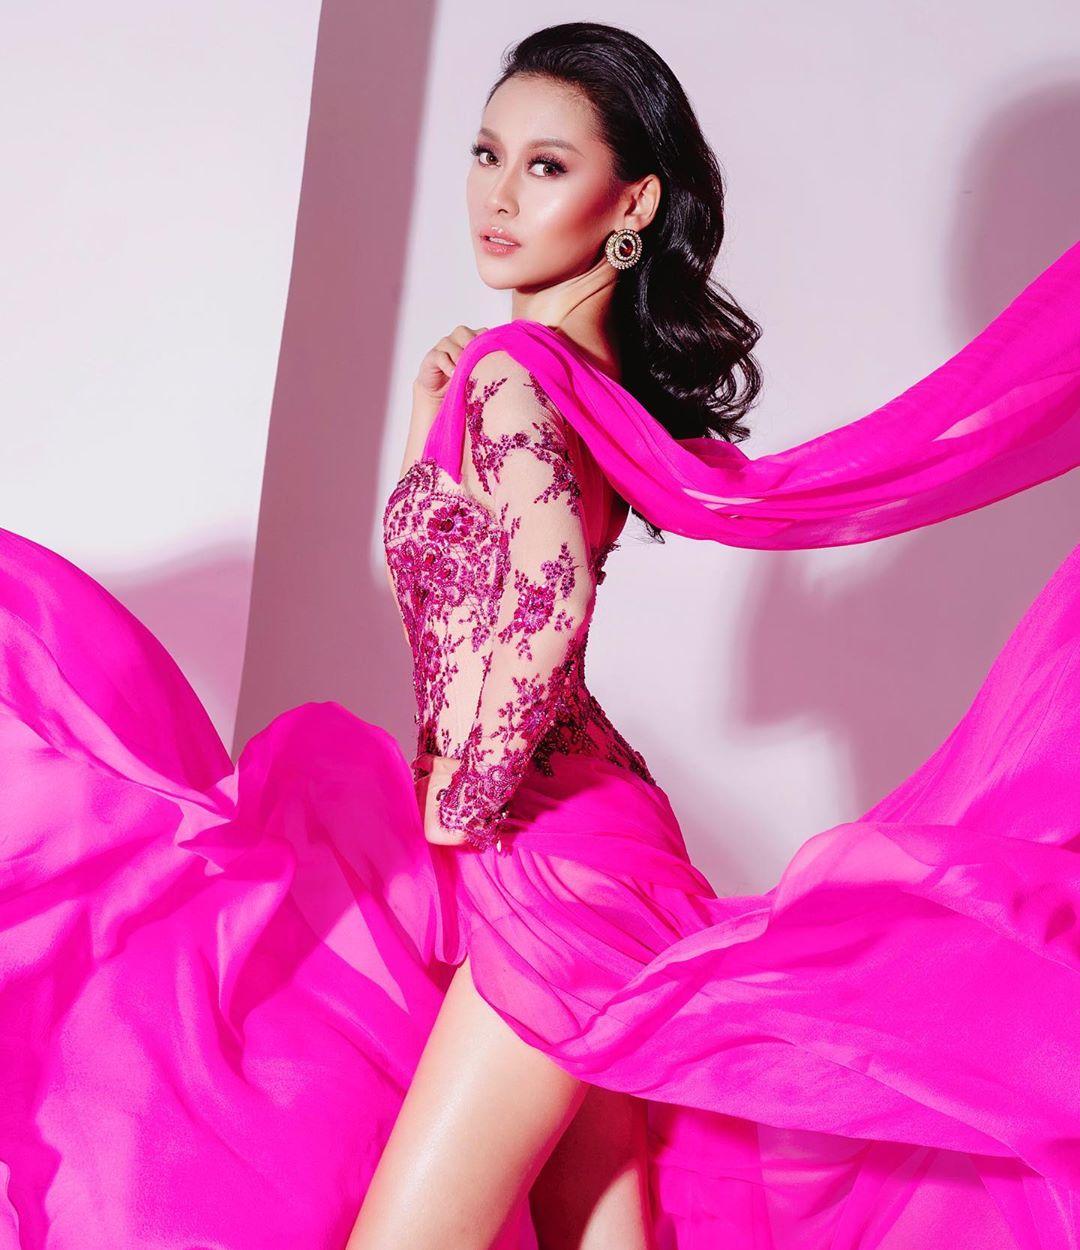 francisca luhong james vence miss universe malaysia 2020. 4oqlgdx2